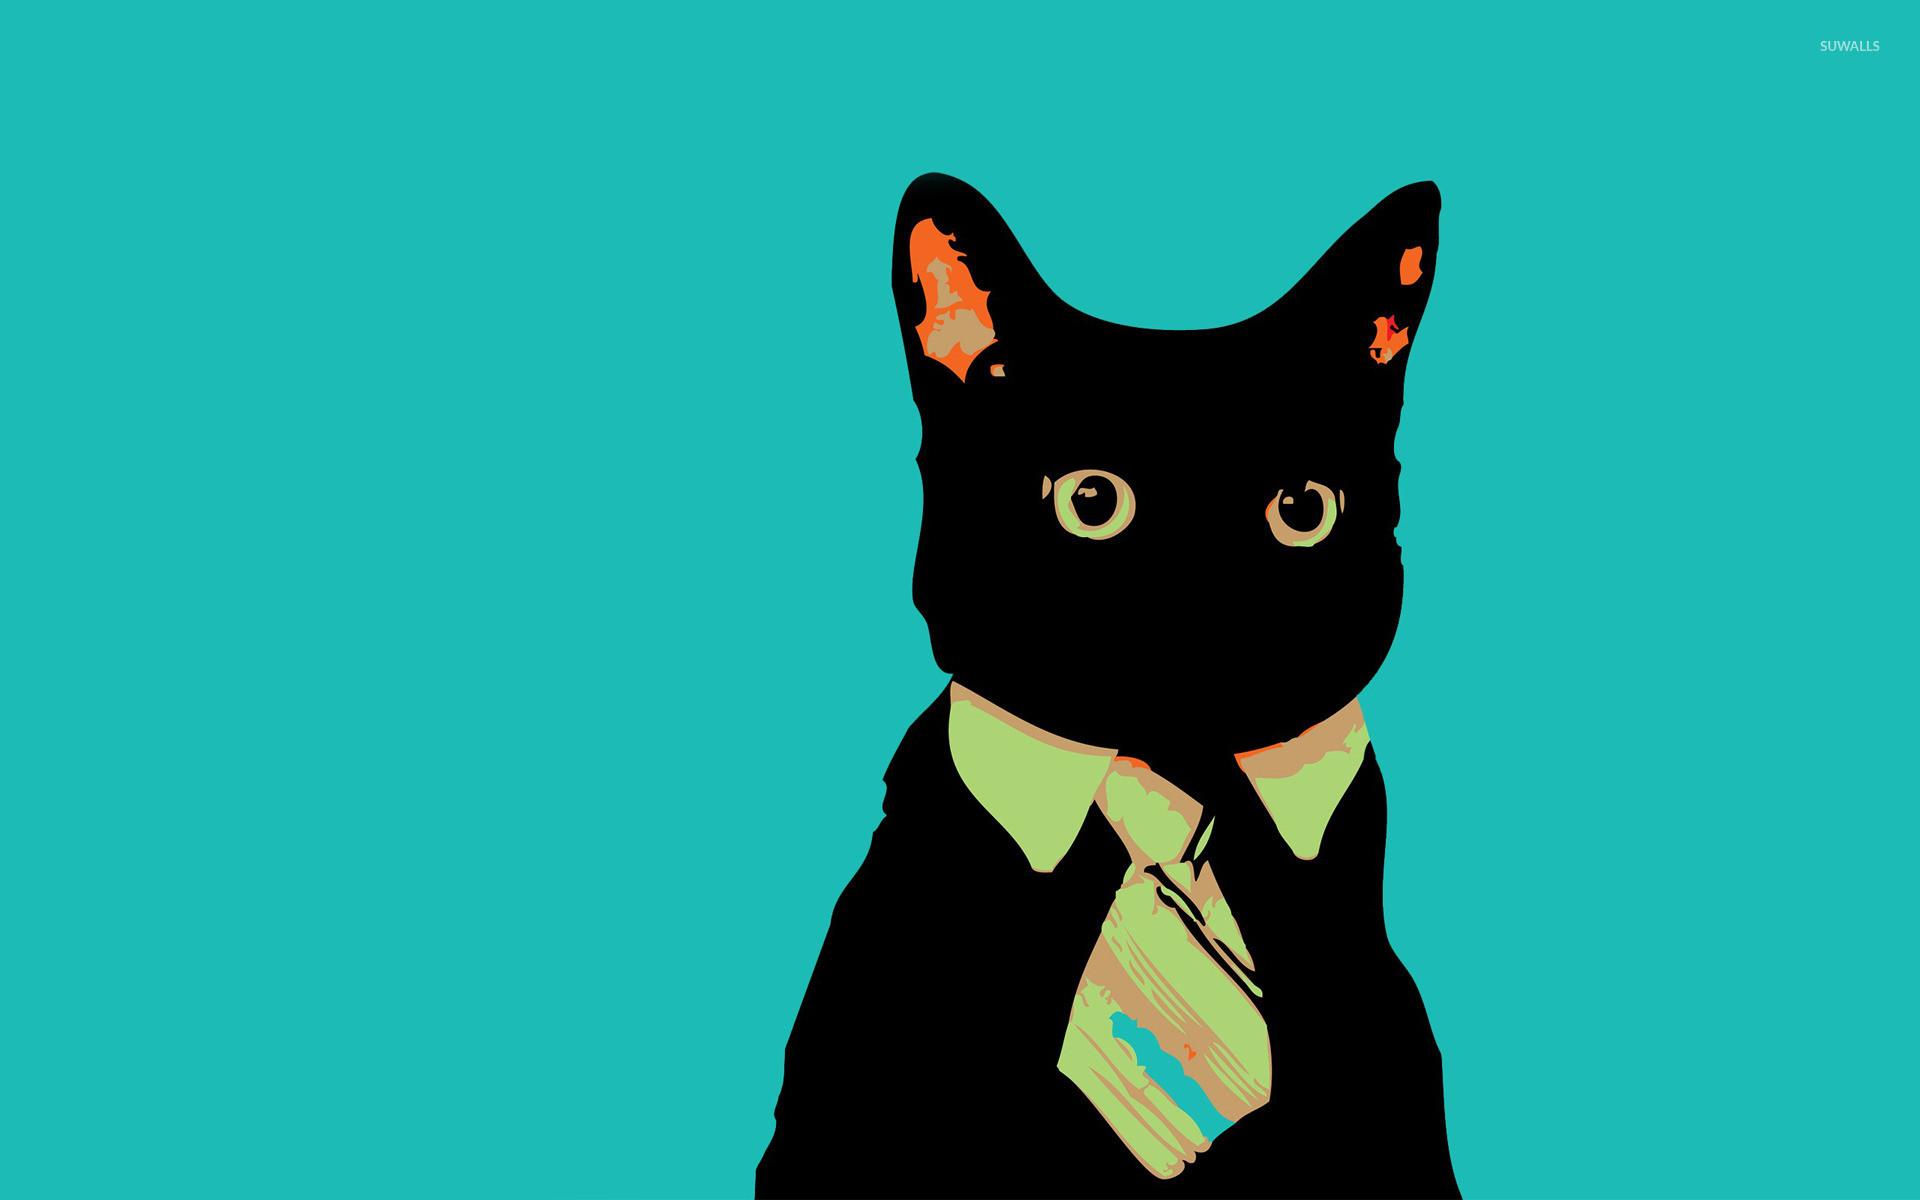 Bussines cat wallpaper jpg